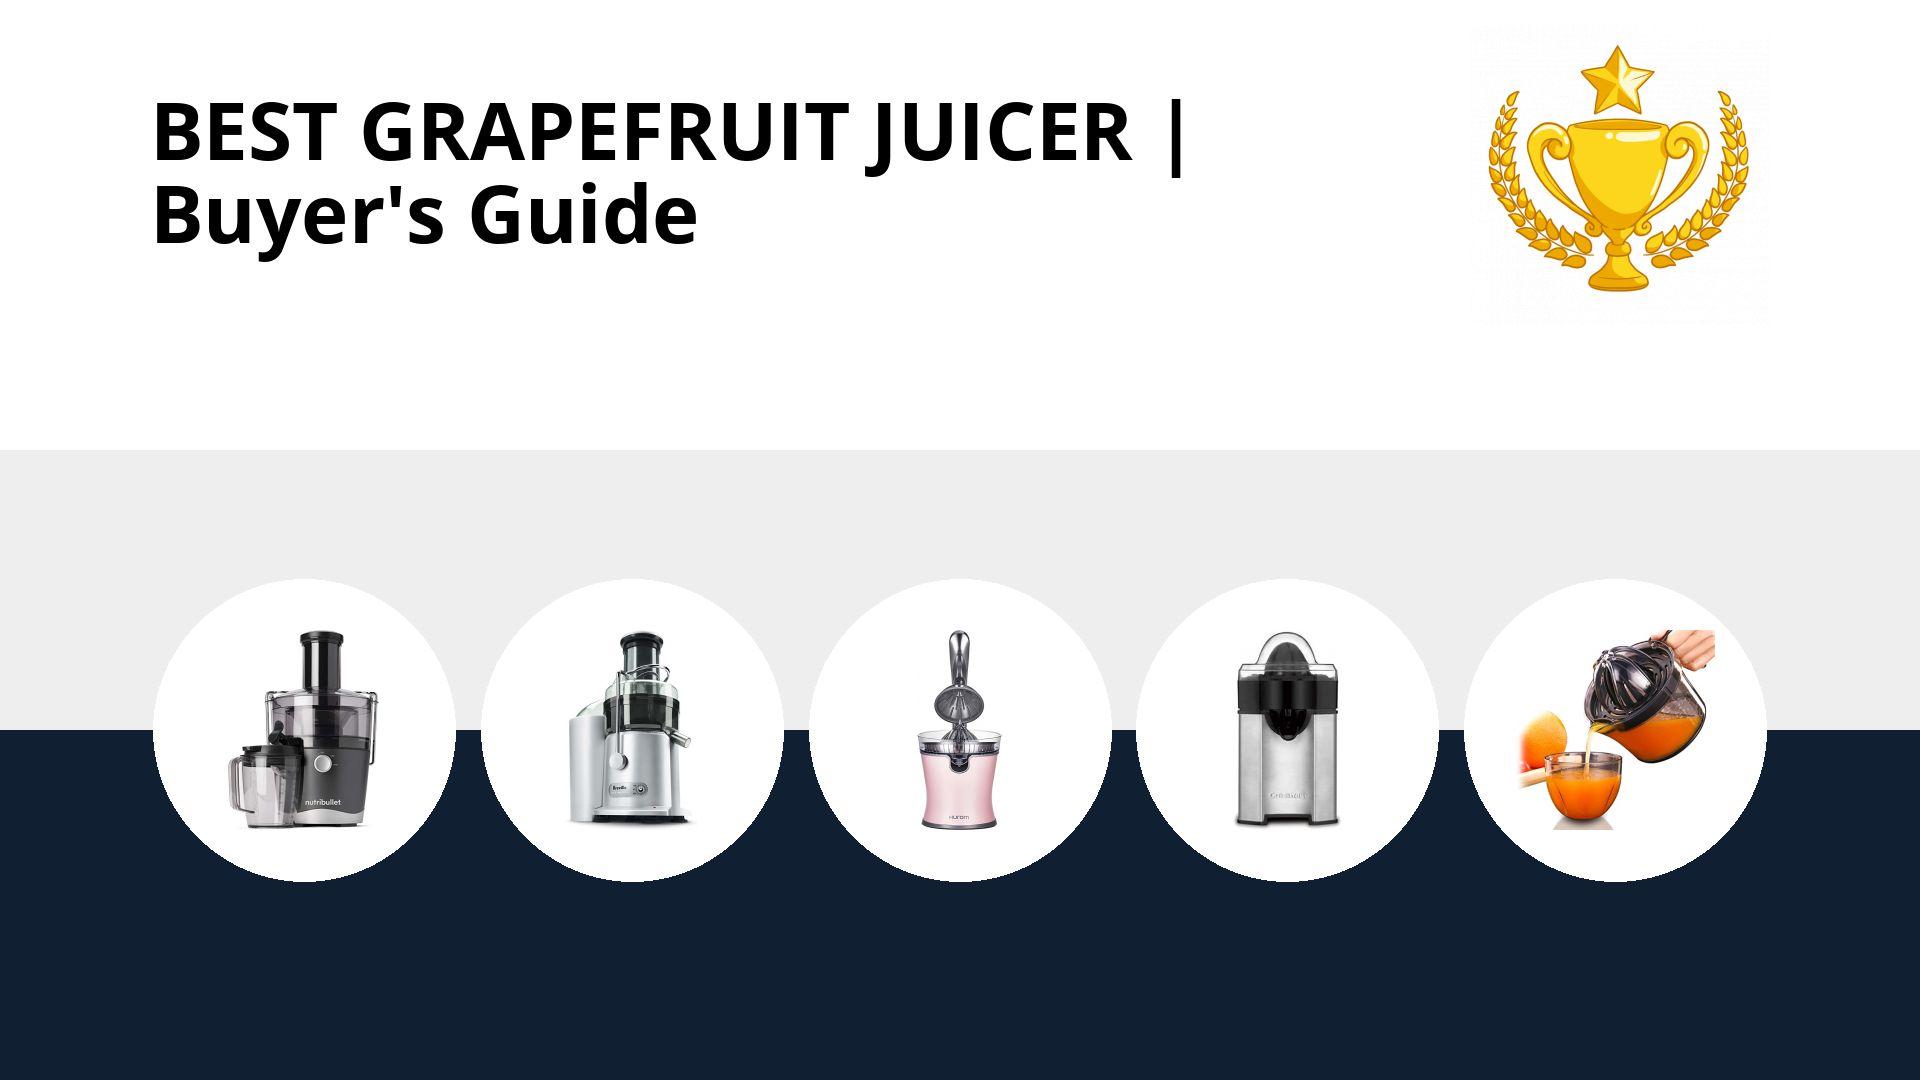 Best Grapefruit Juicer: image